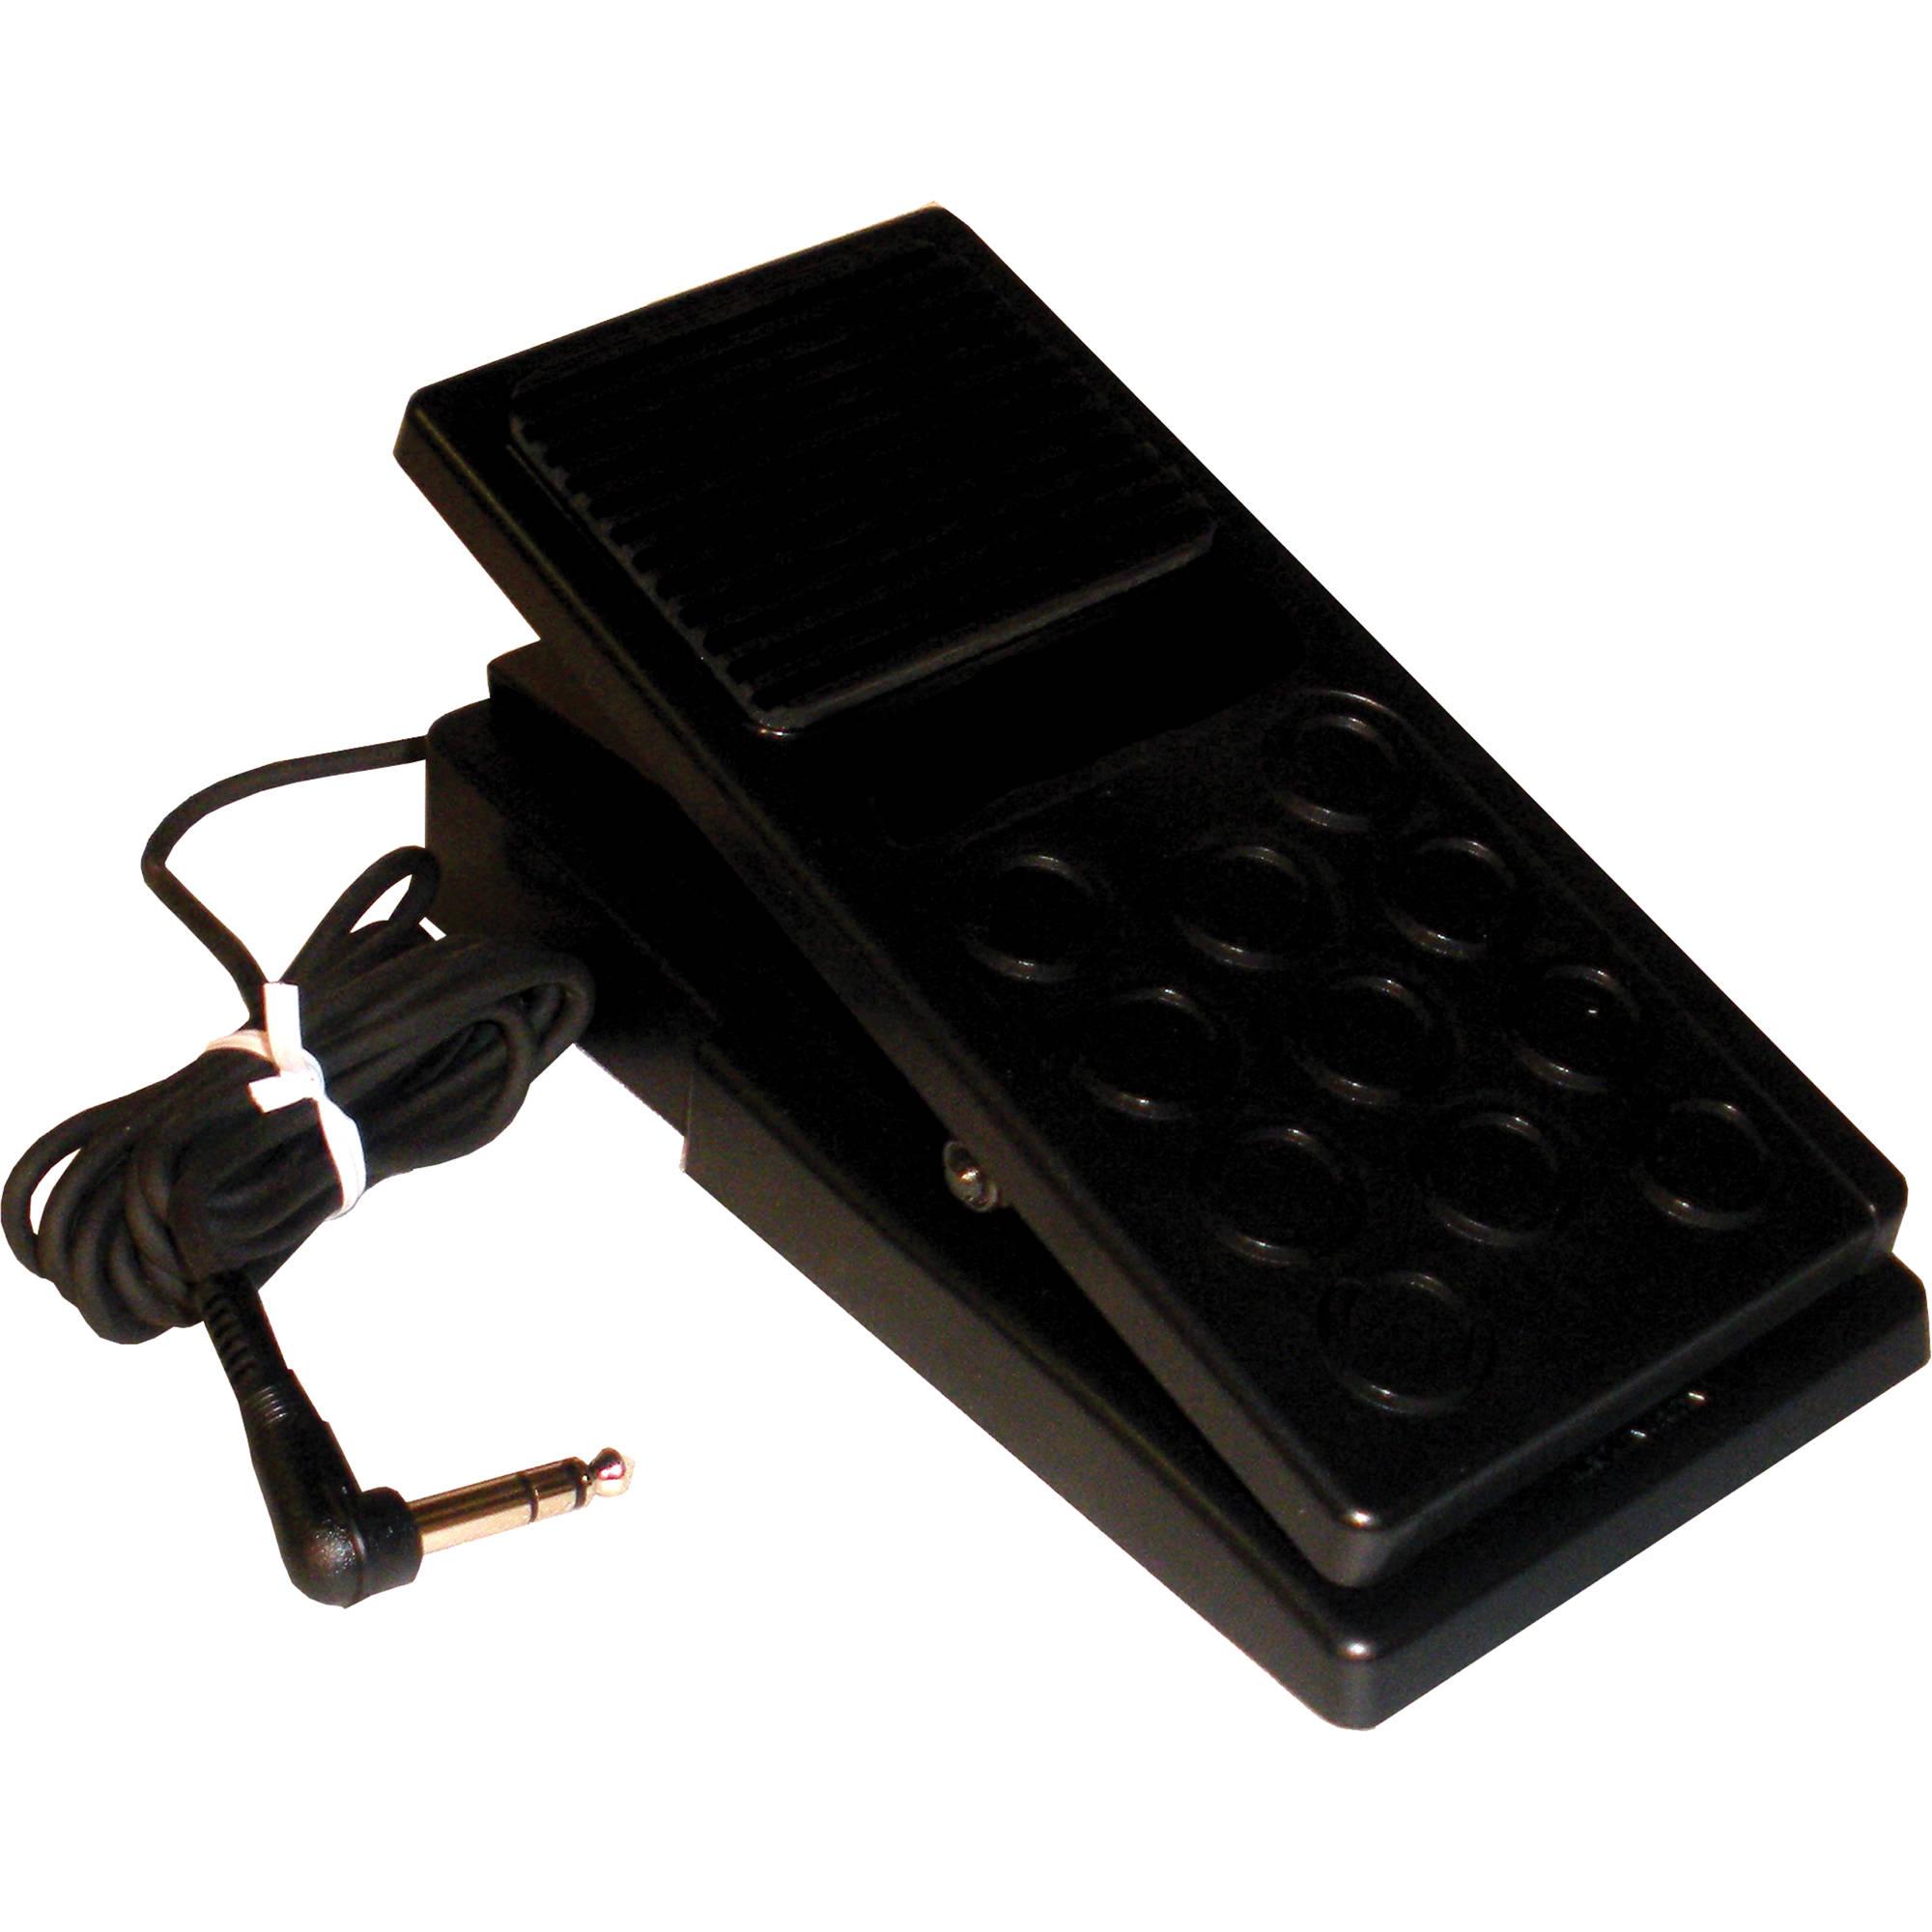 hammond v 20rt leslie speed control pedal v 20rt b h photo video. Black Bedroom Furniture Sets. Home Design Ideas